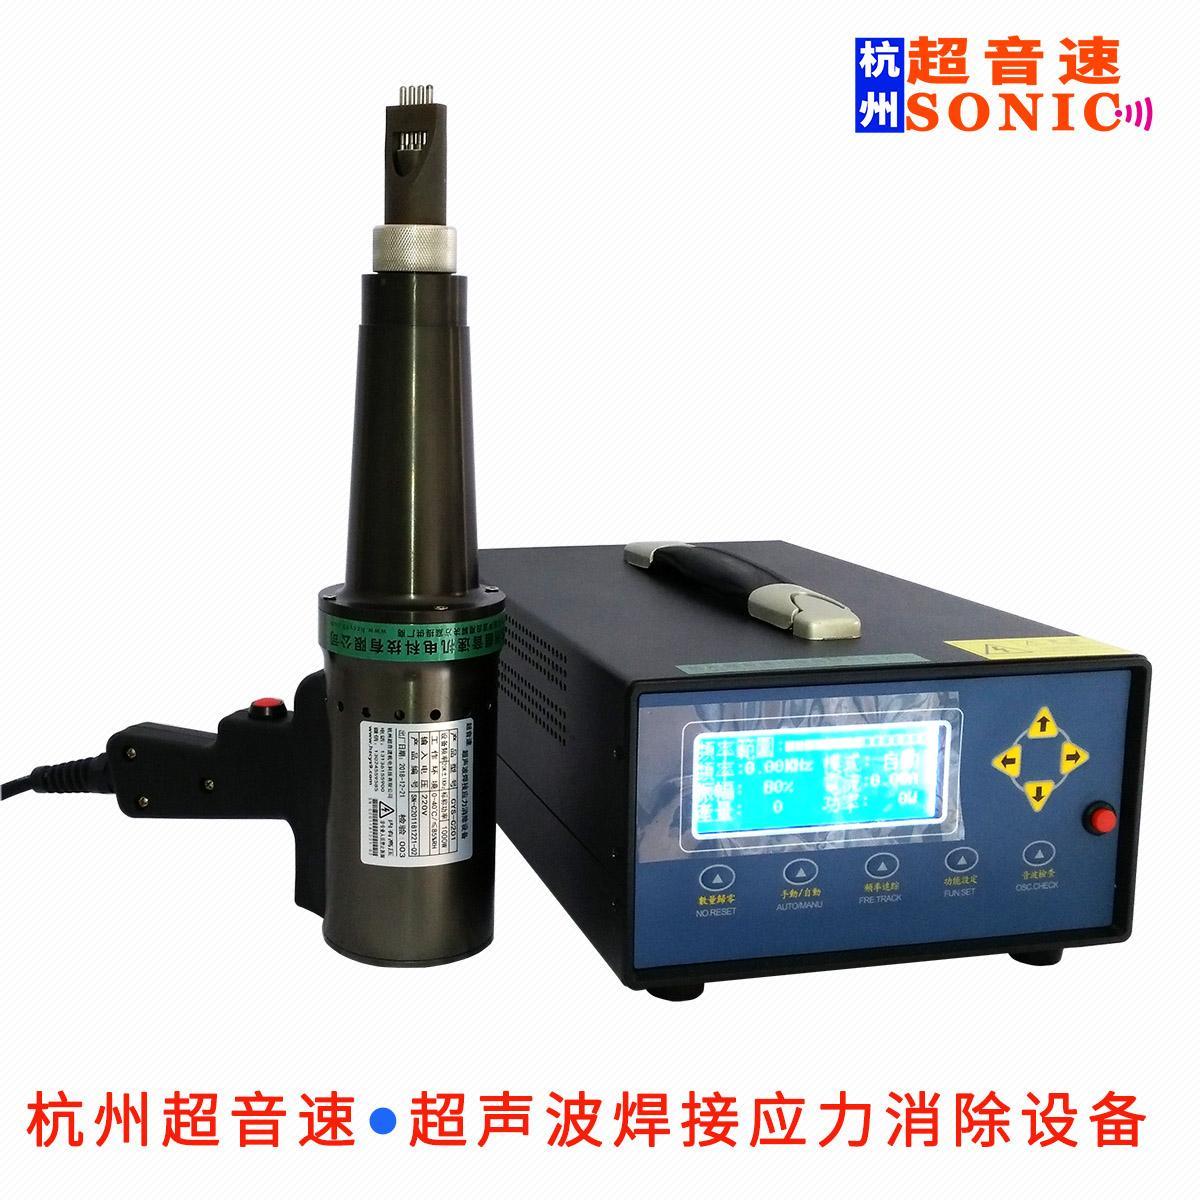 CYS-C20超聲波焊接應力消除設備 5